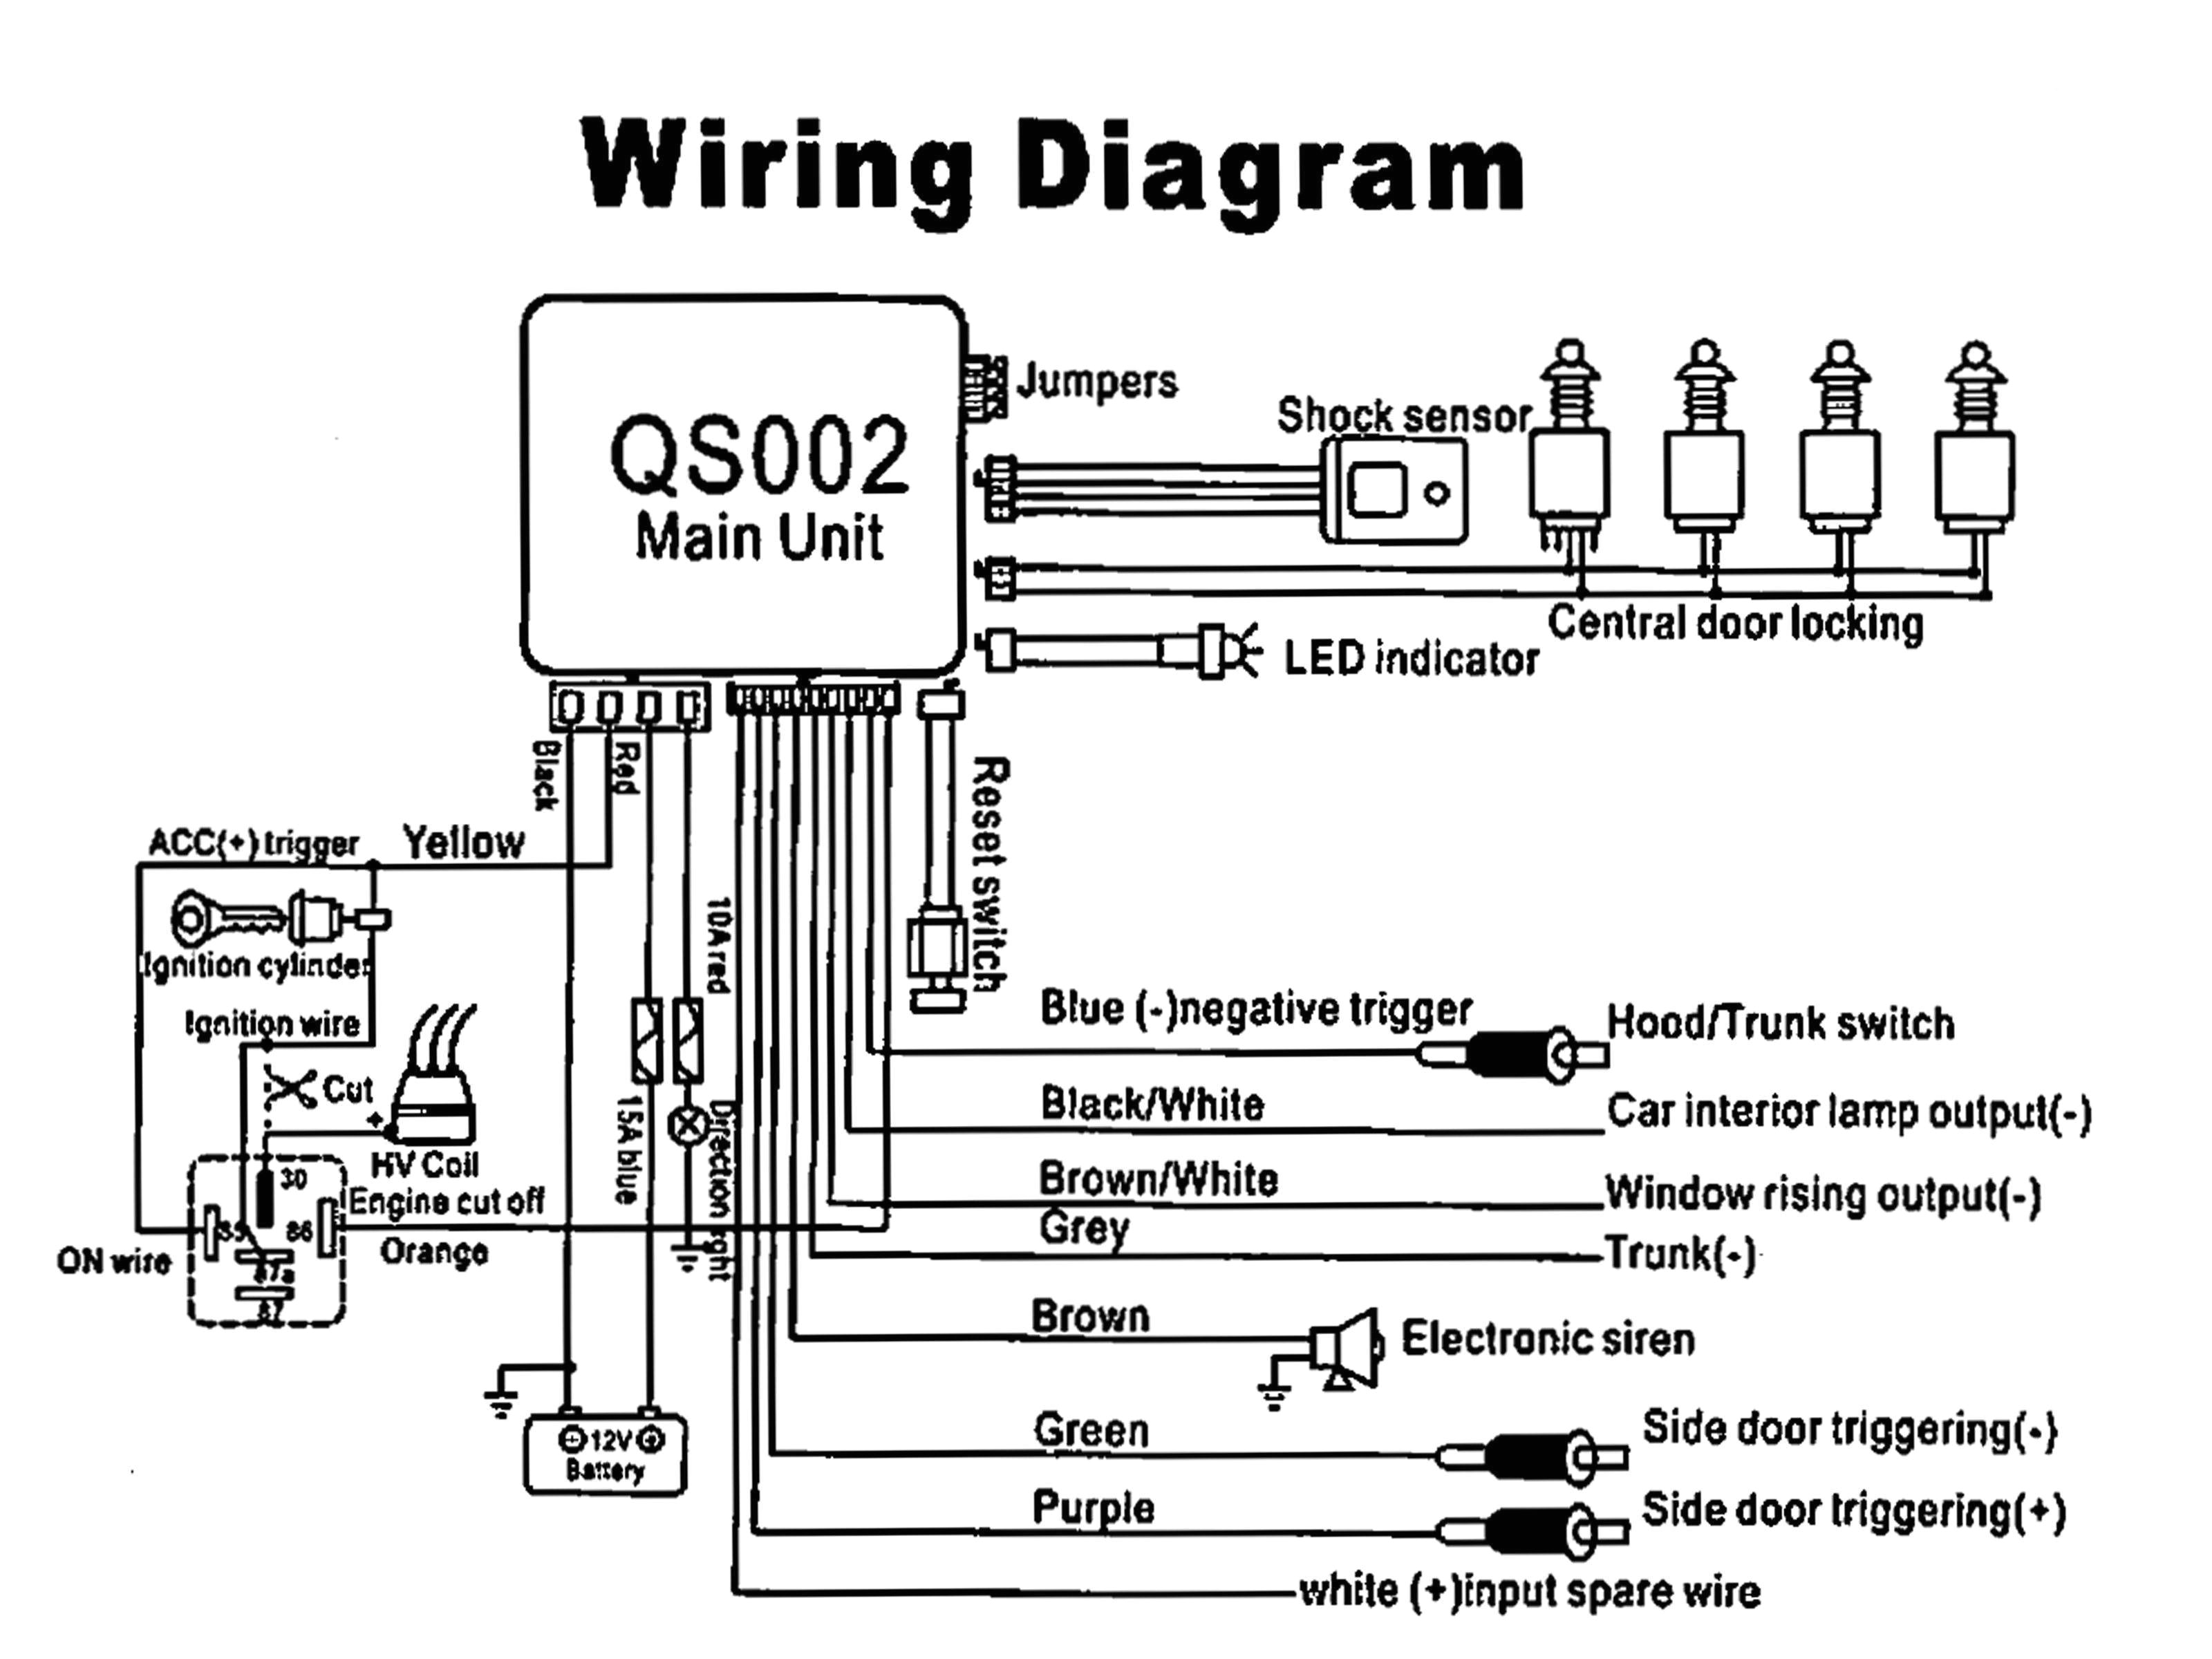 car alarm wiring diagram new avs best of within within car alarm wiring diagram jpg